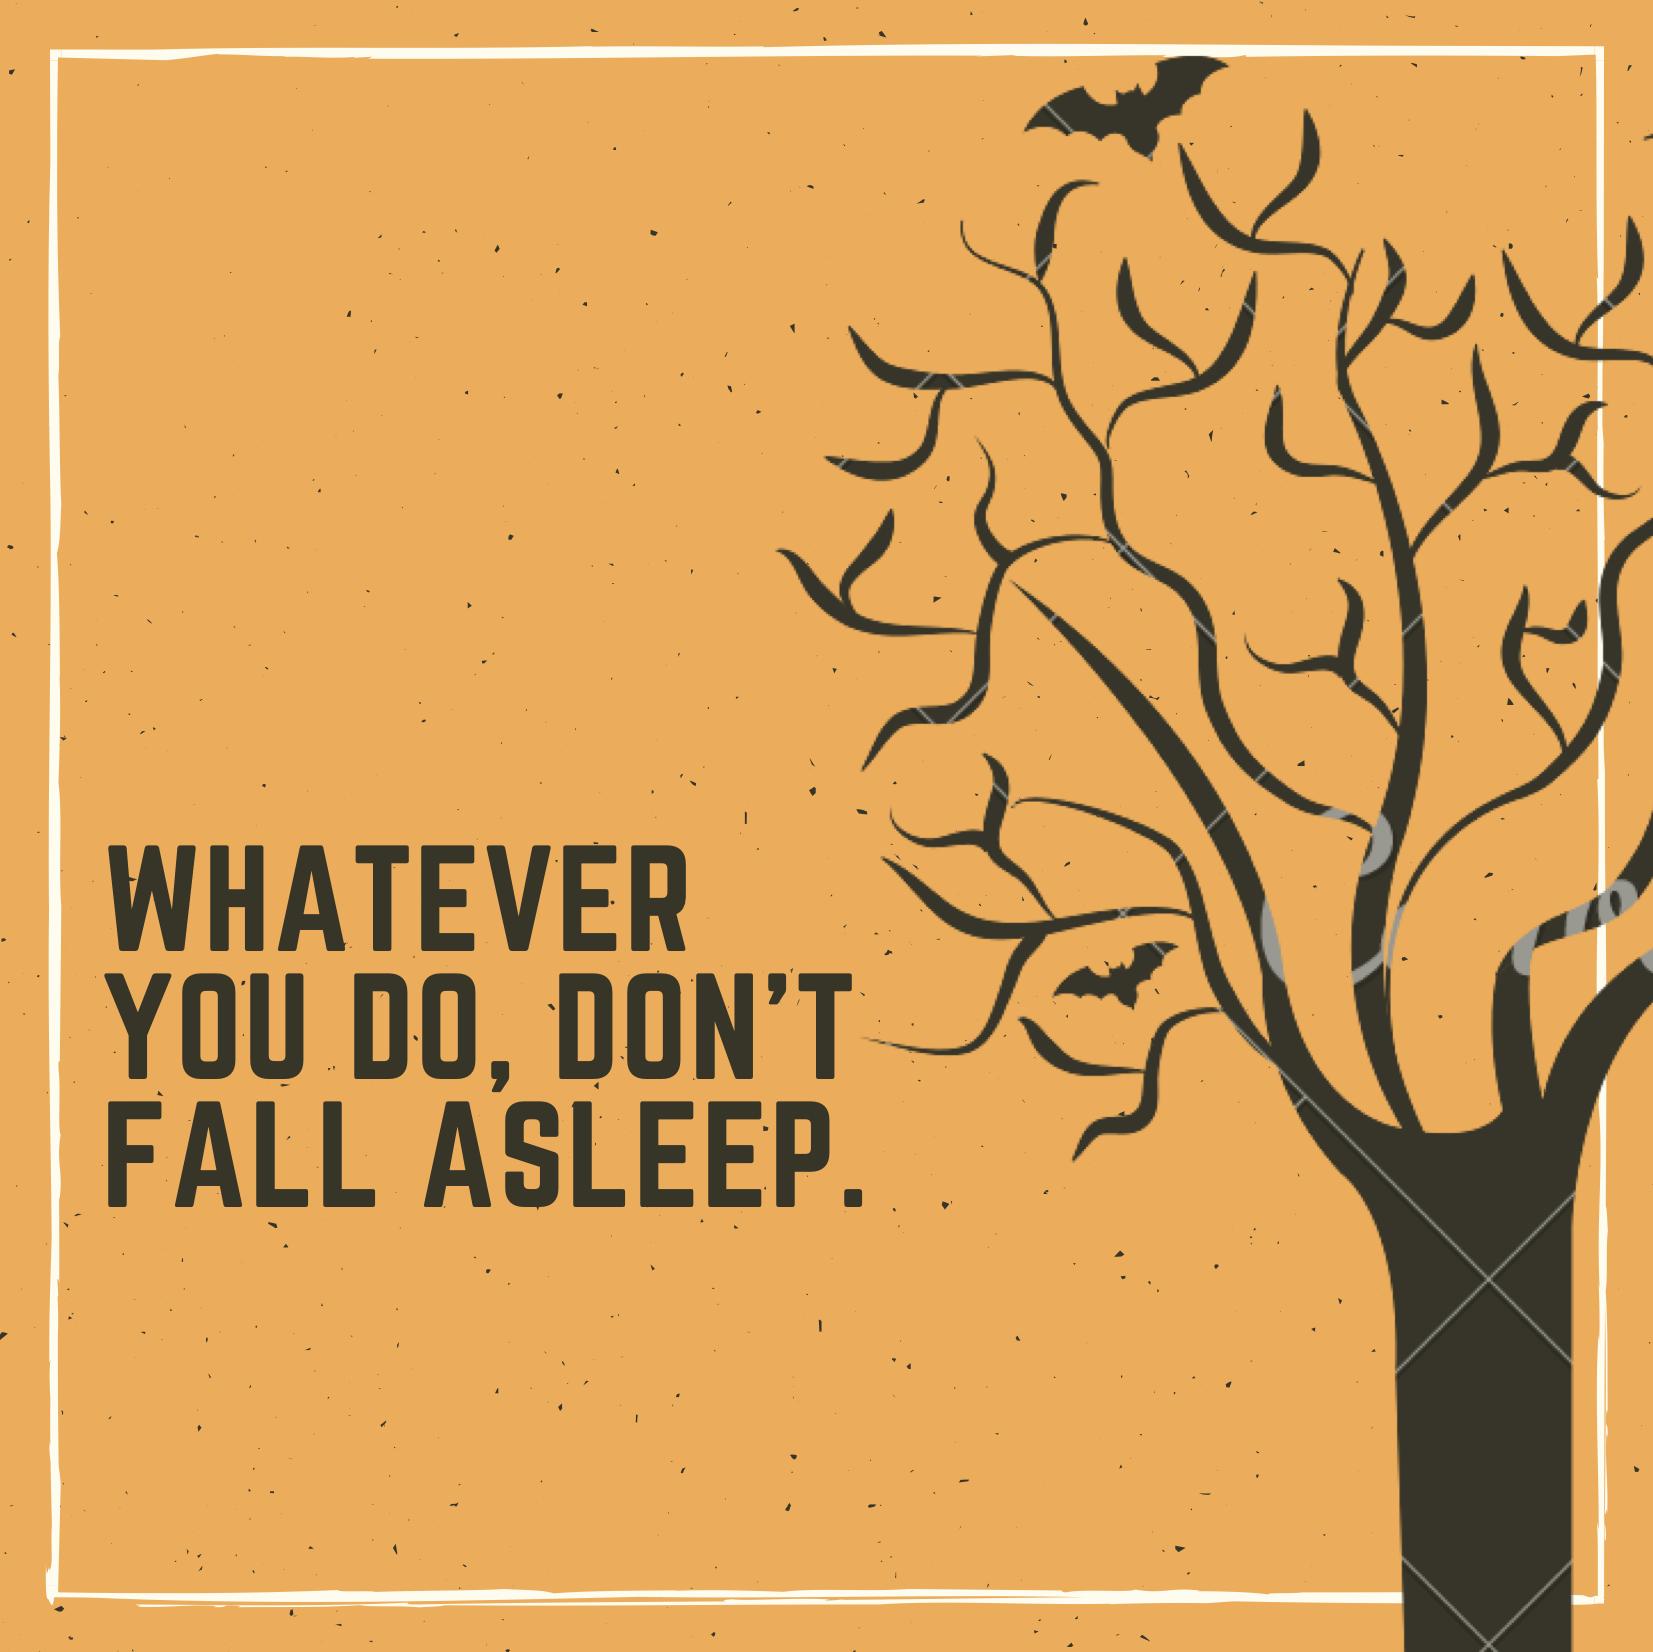 Whatever you do, don't fall asleep.